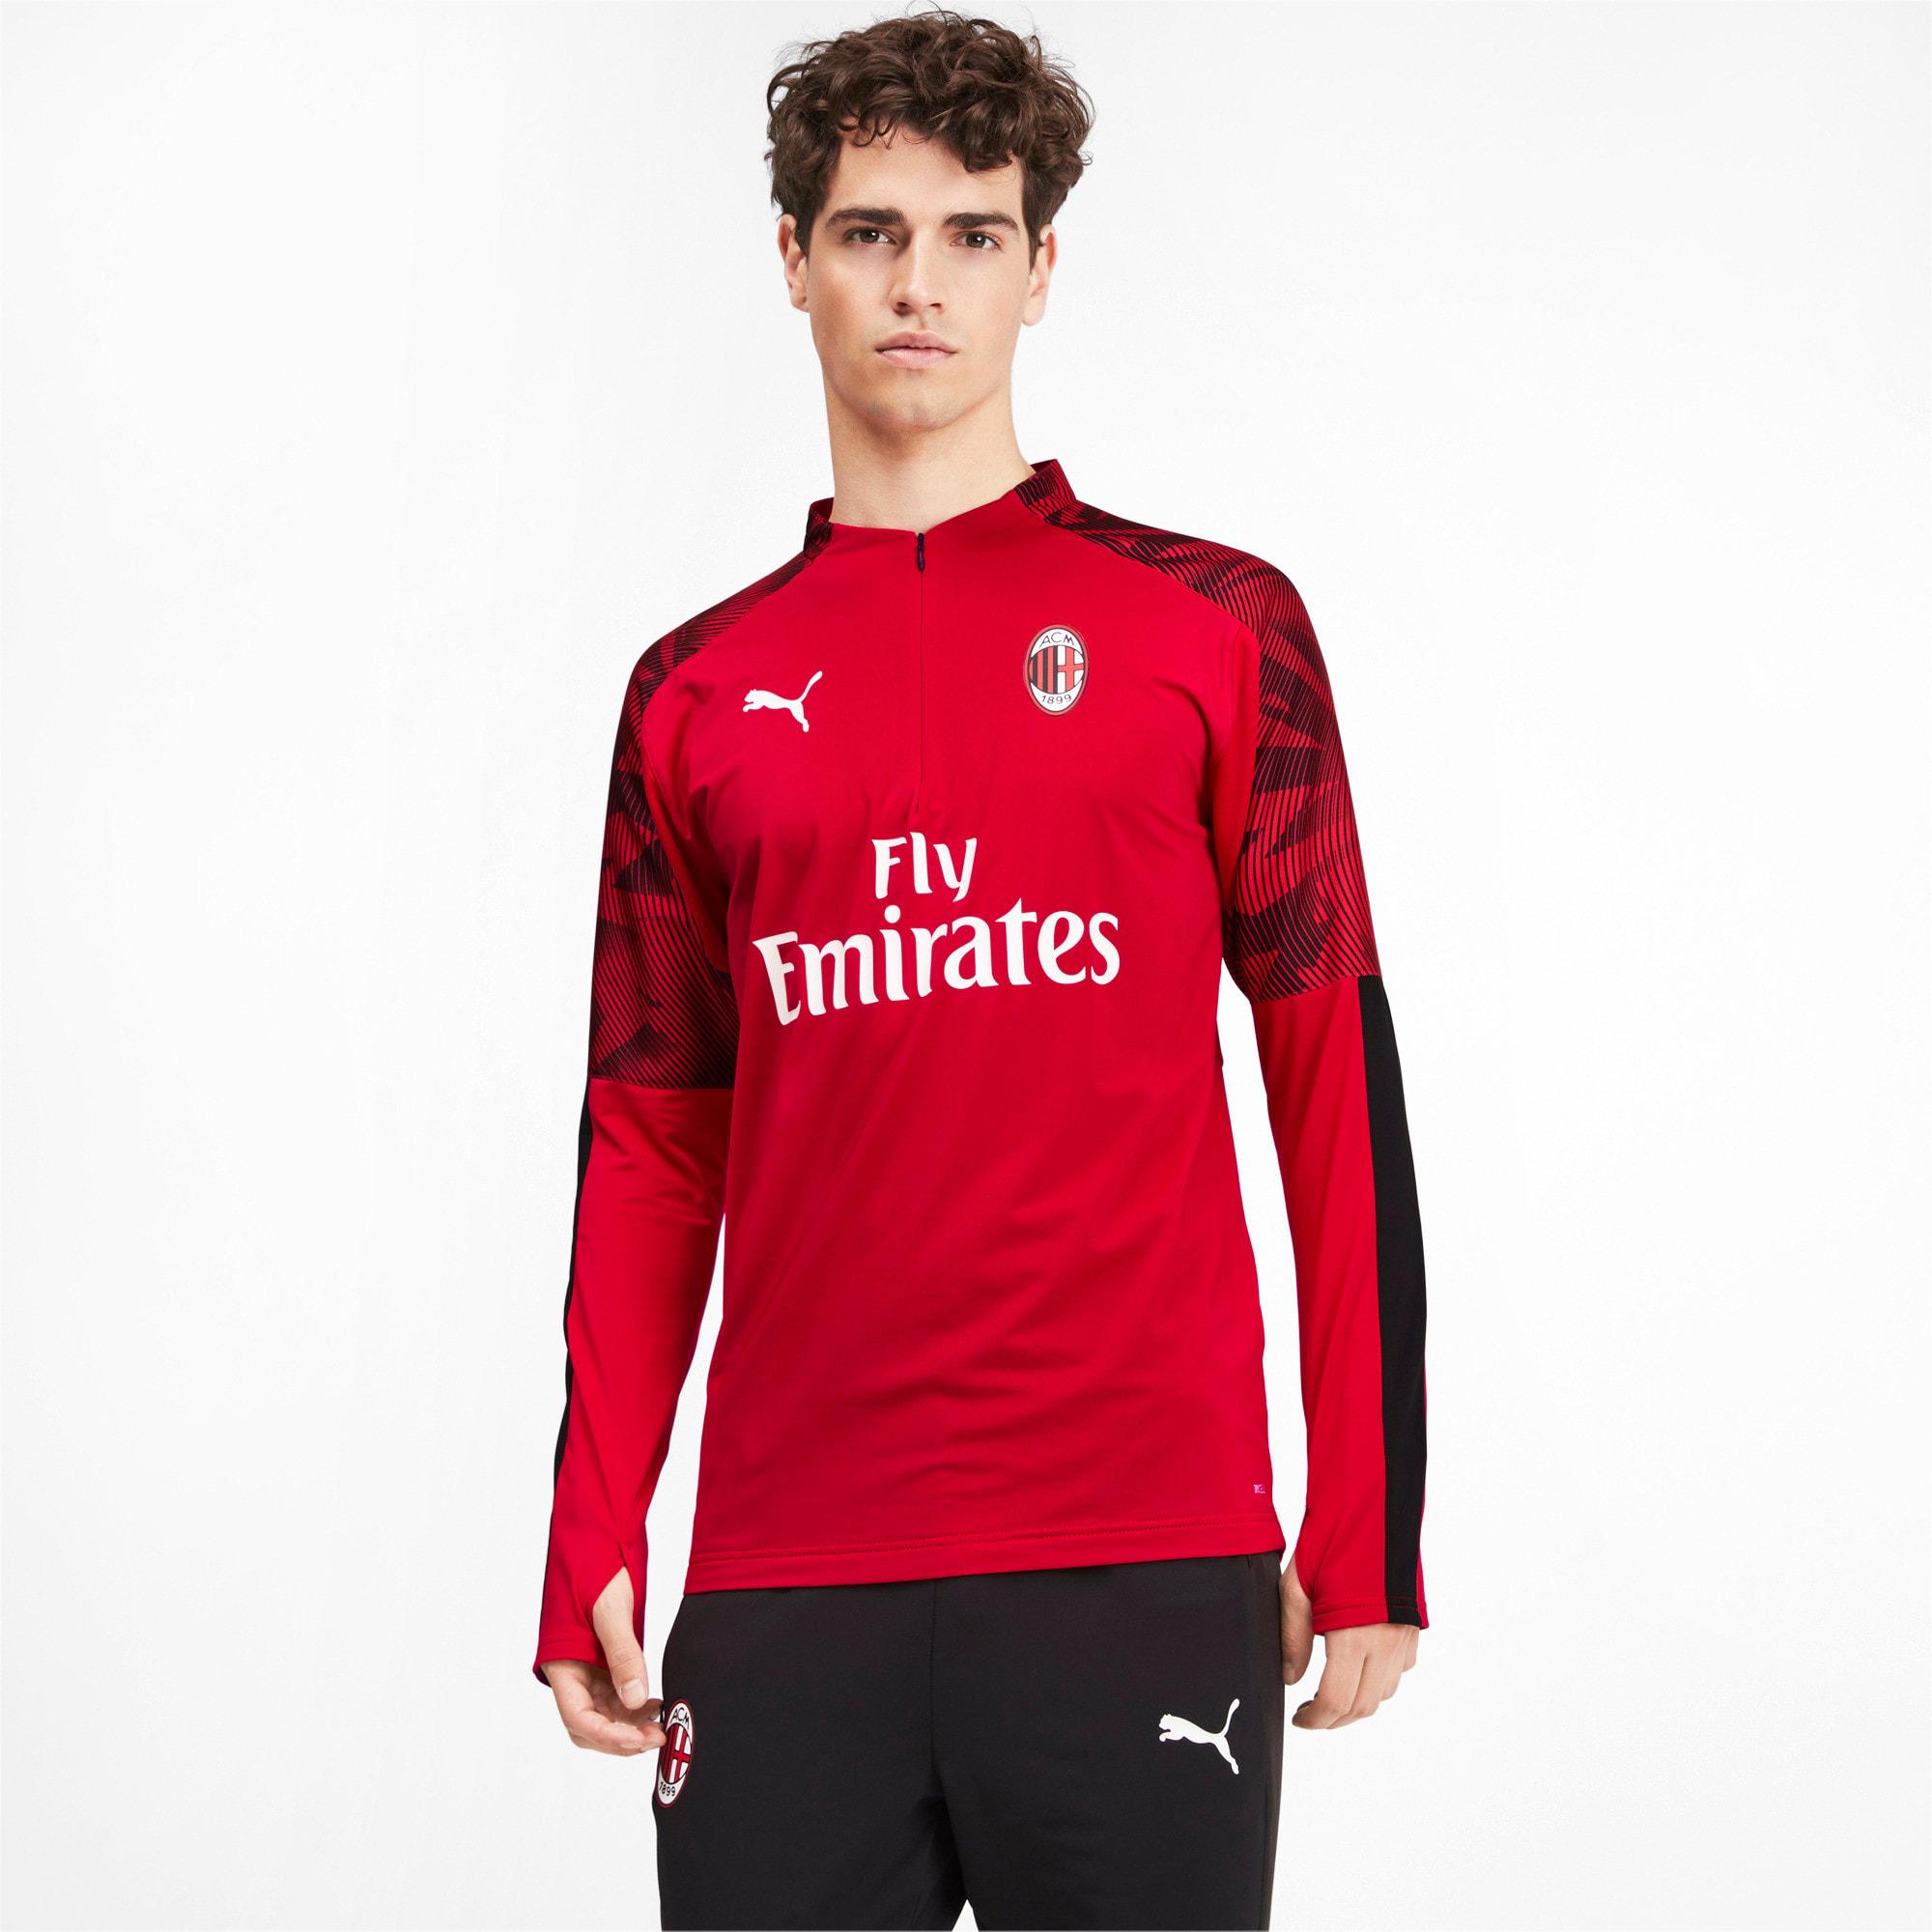 Thumbnail 1 of AC Milan Men's 1/4 Zip Top, Tango Red -Puma Black, medium